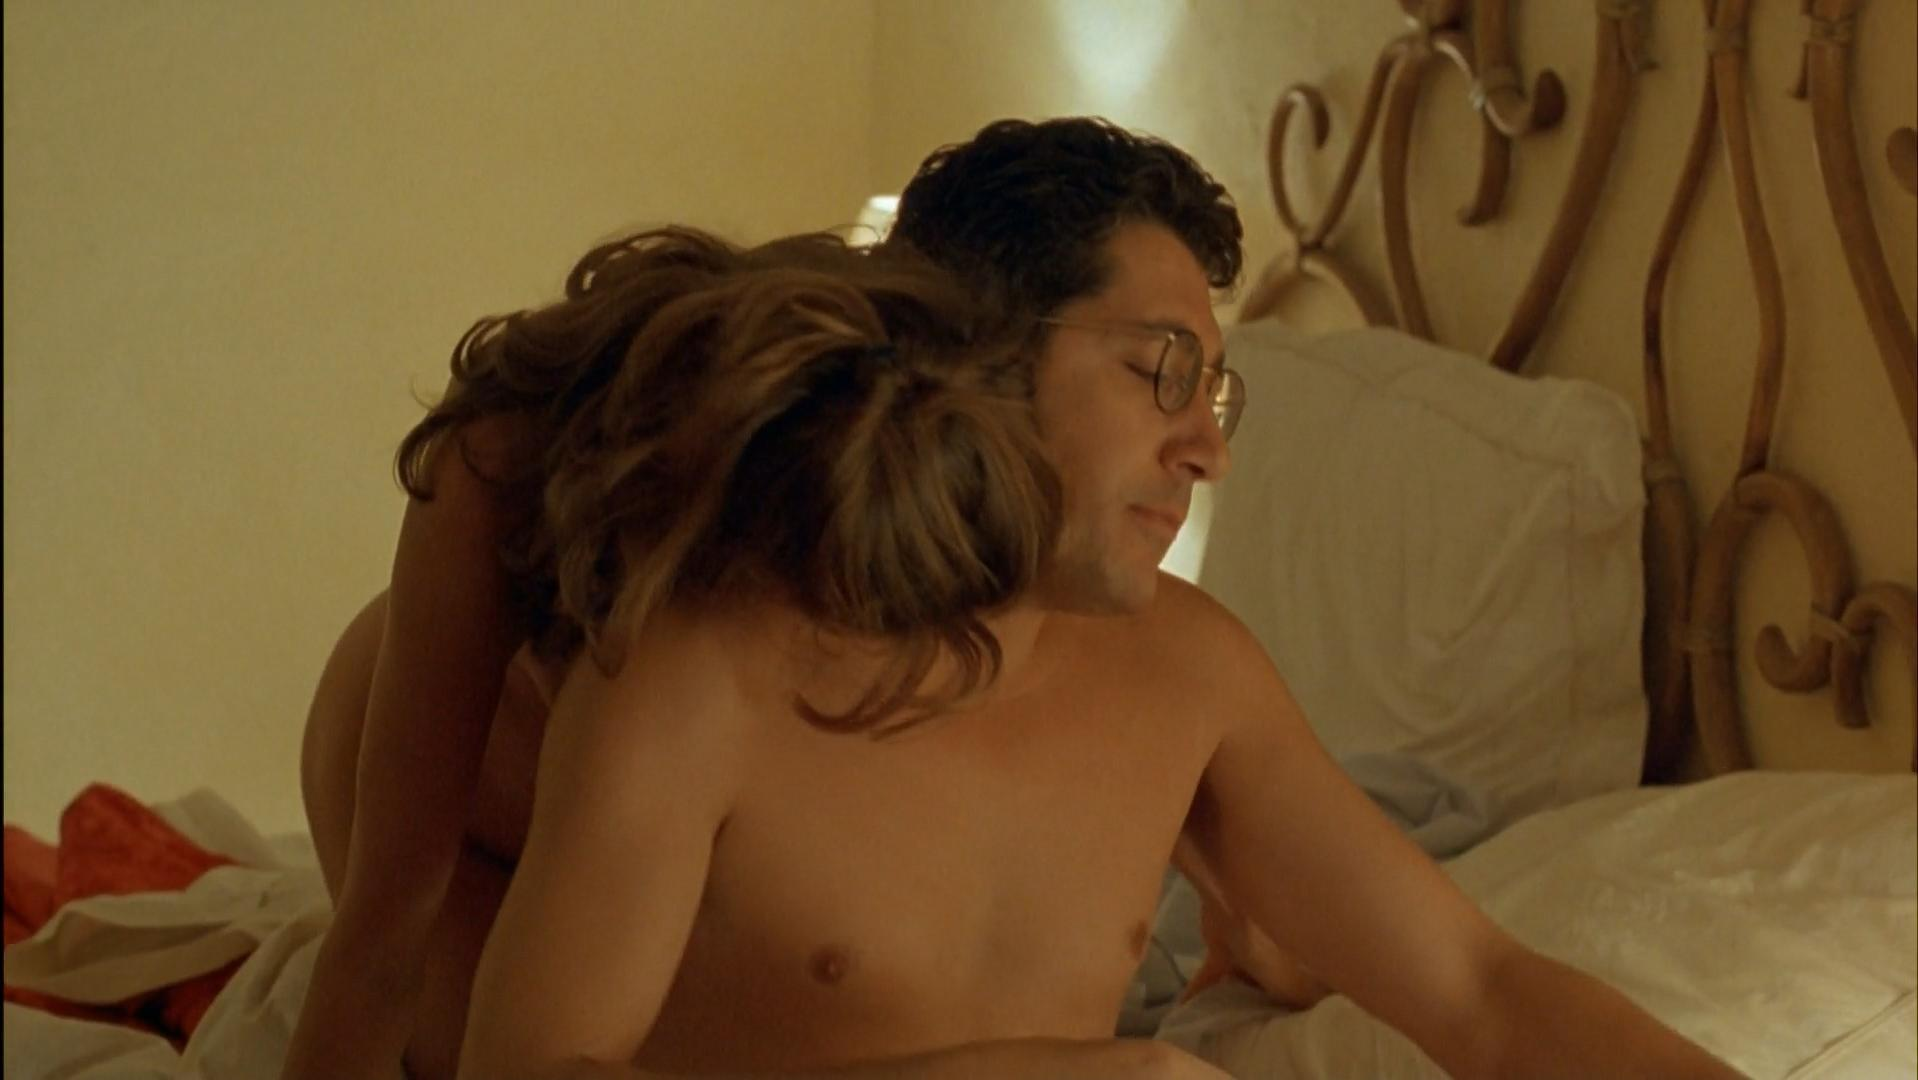 Victoria Abril nude, Josiane Balasko nude - French Twist (1996)